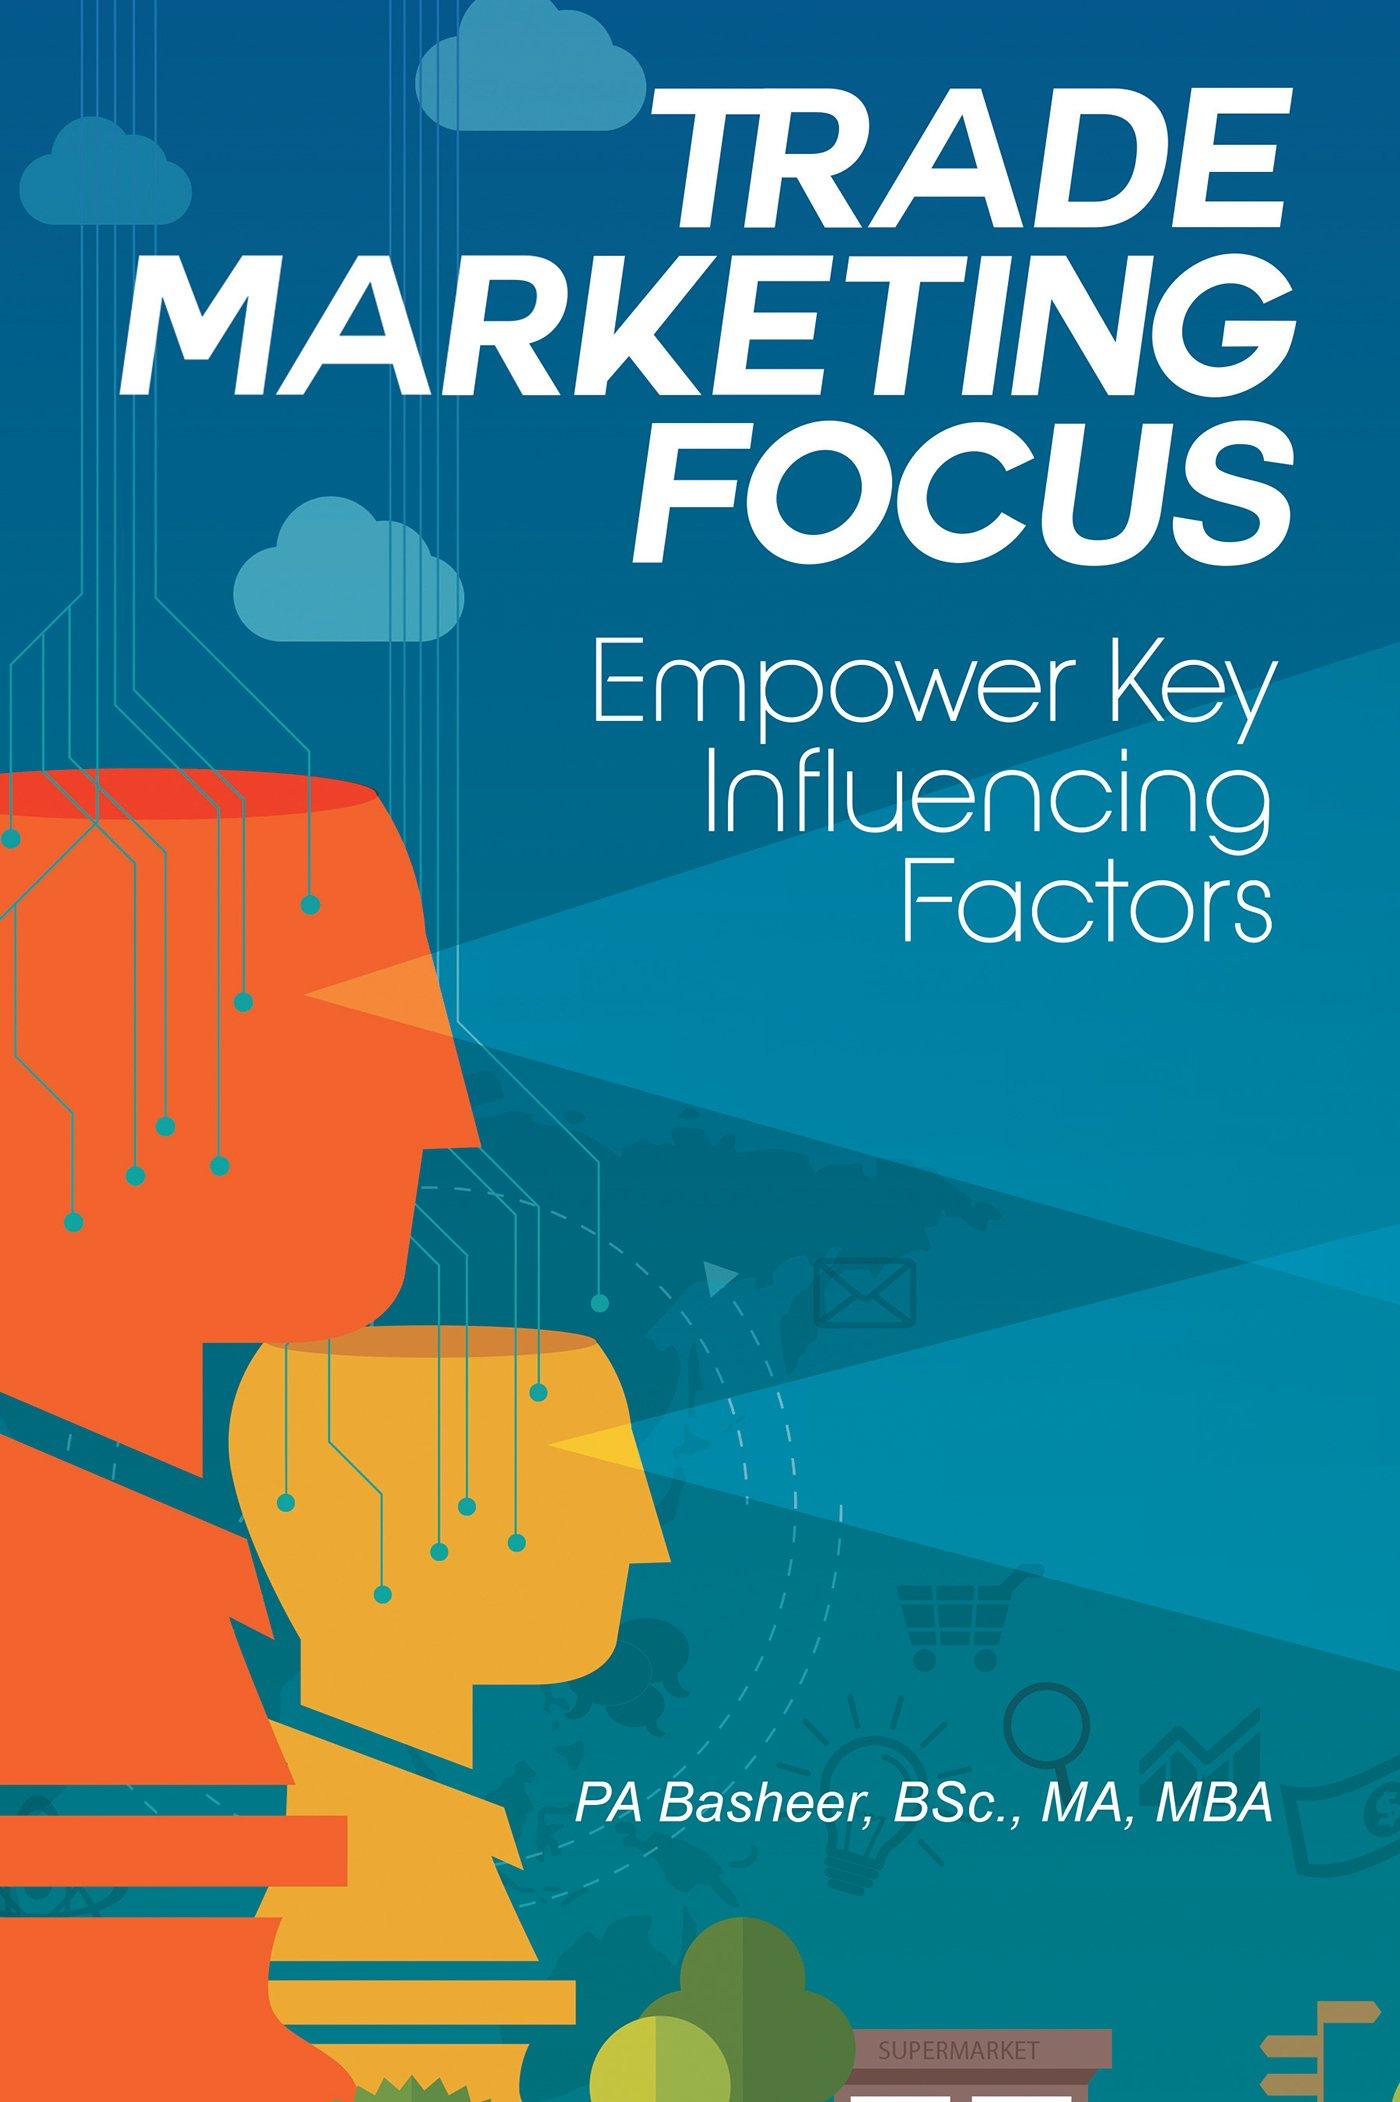 Trade Marketing Focus: Empower Key Influencing Factors